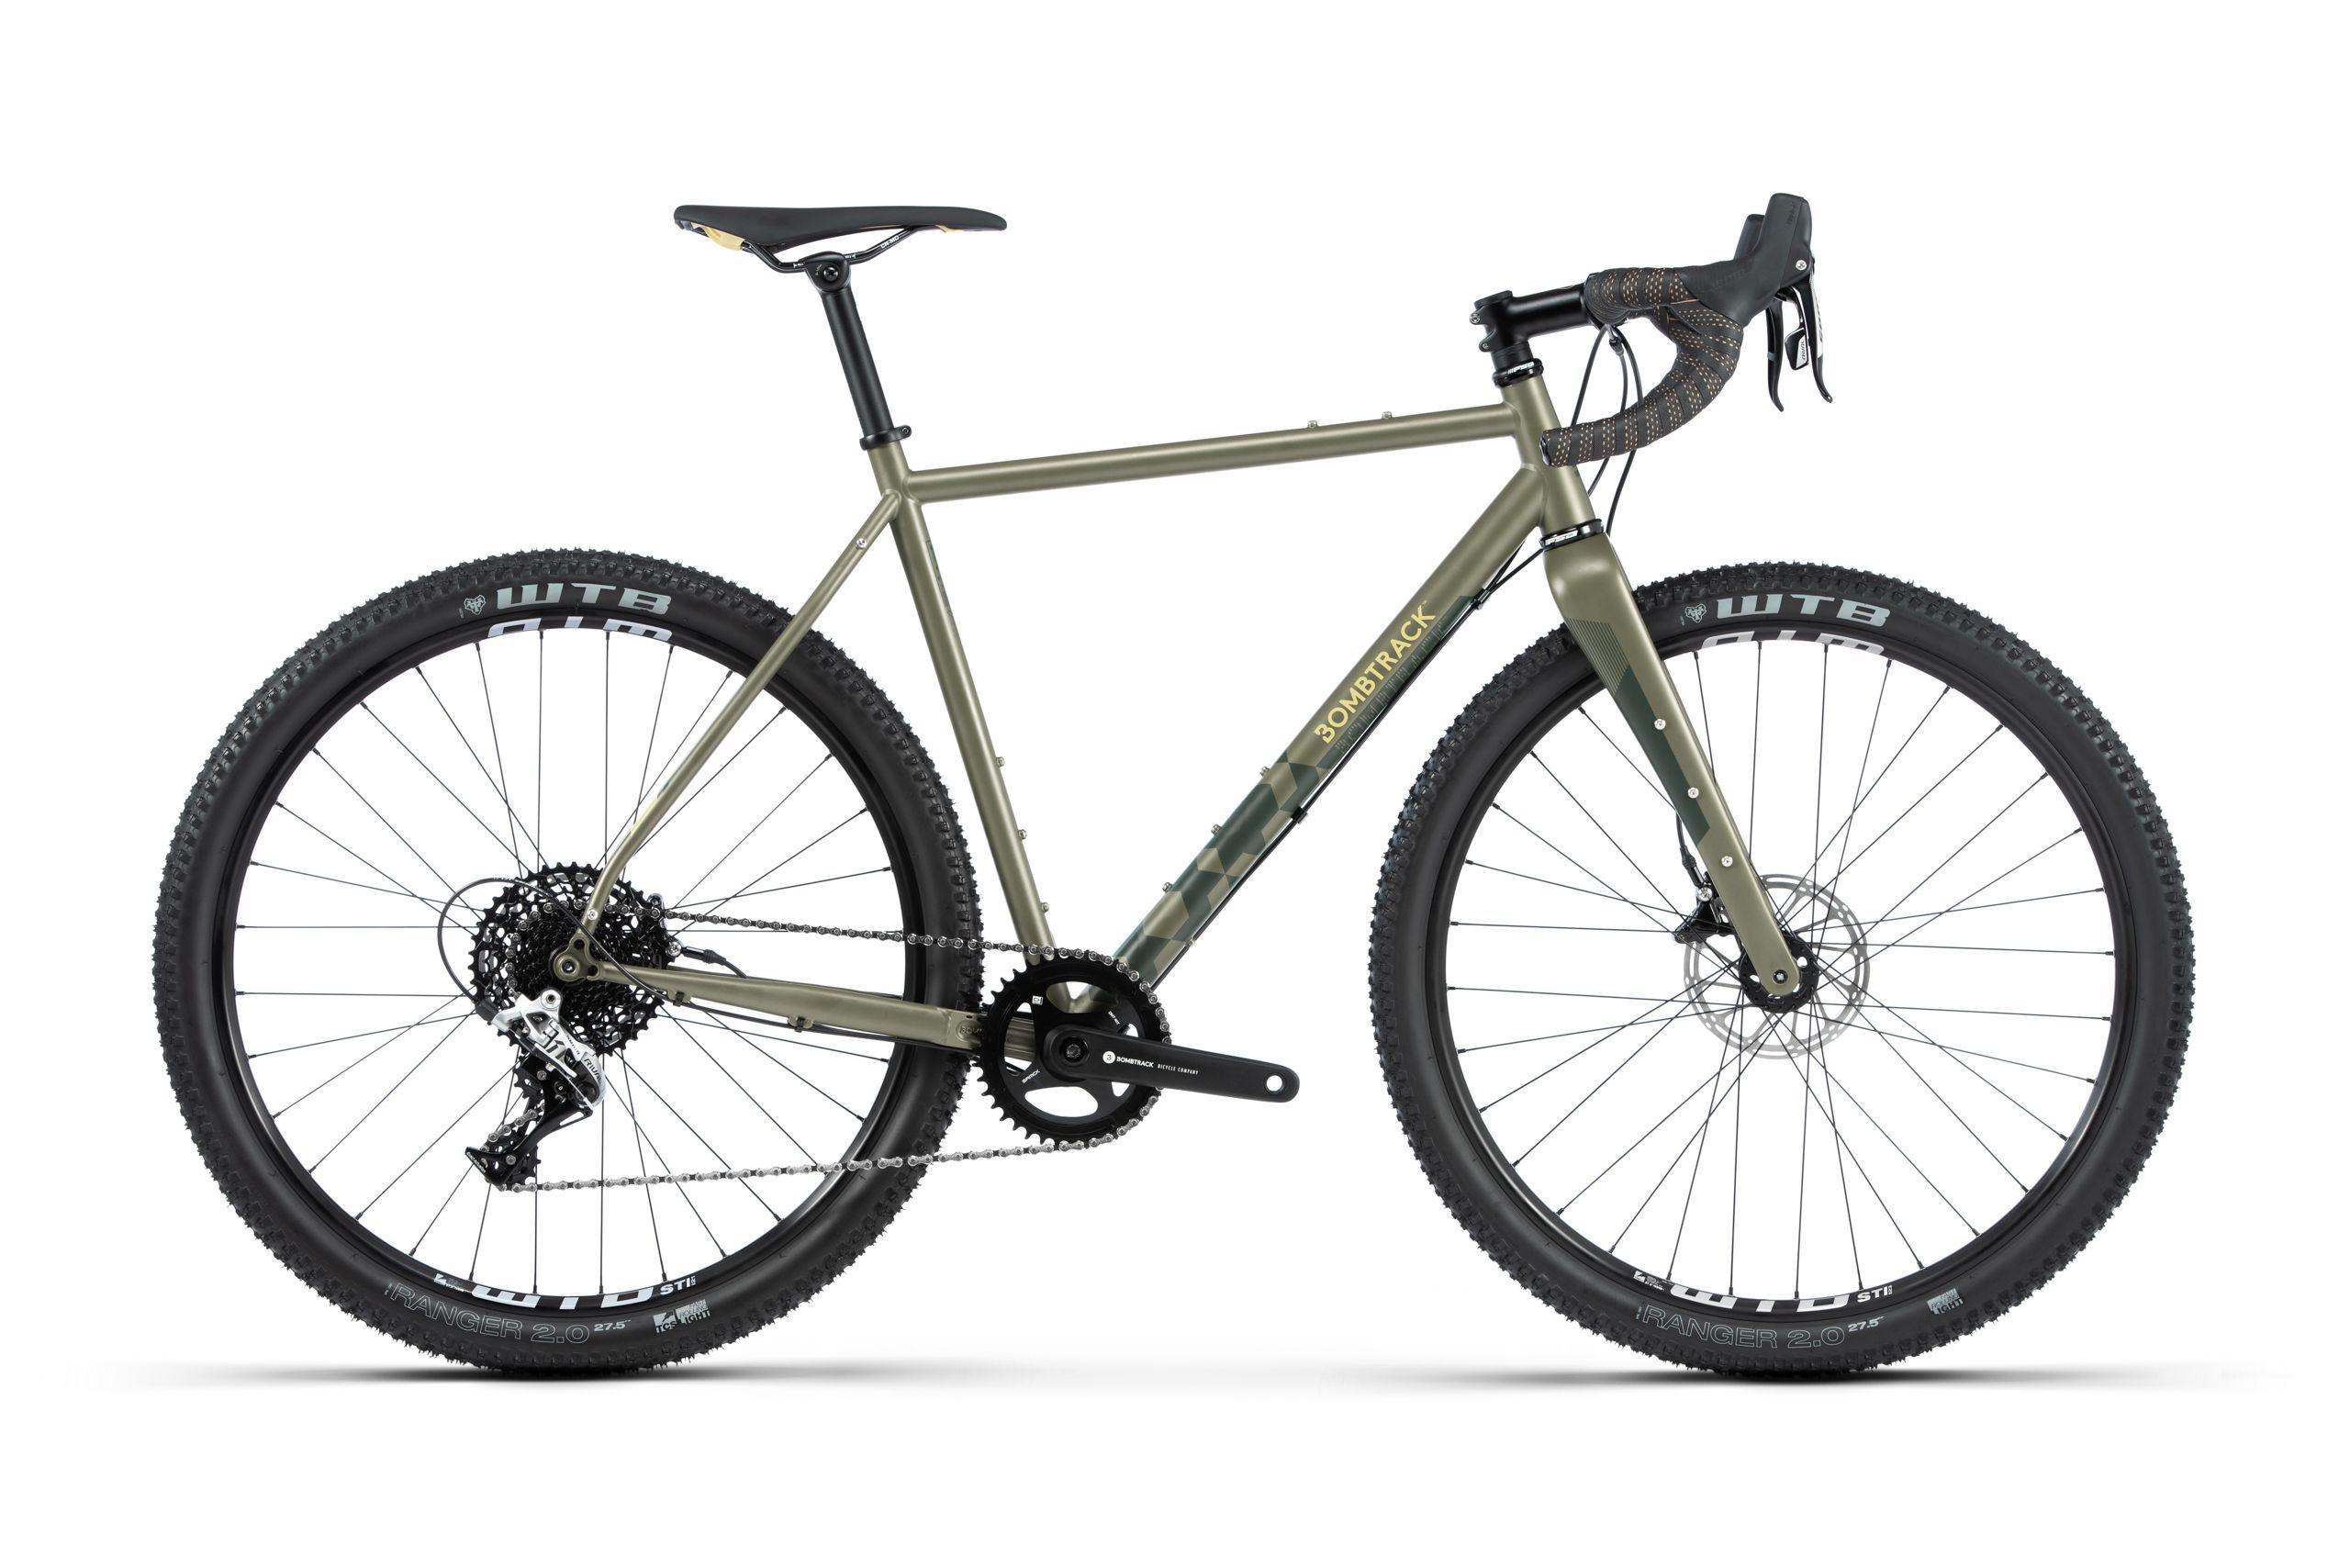 Bombtrack Hook Ext All Road Bike 2020 | Road bikes